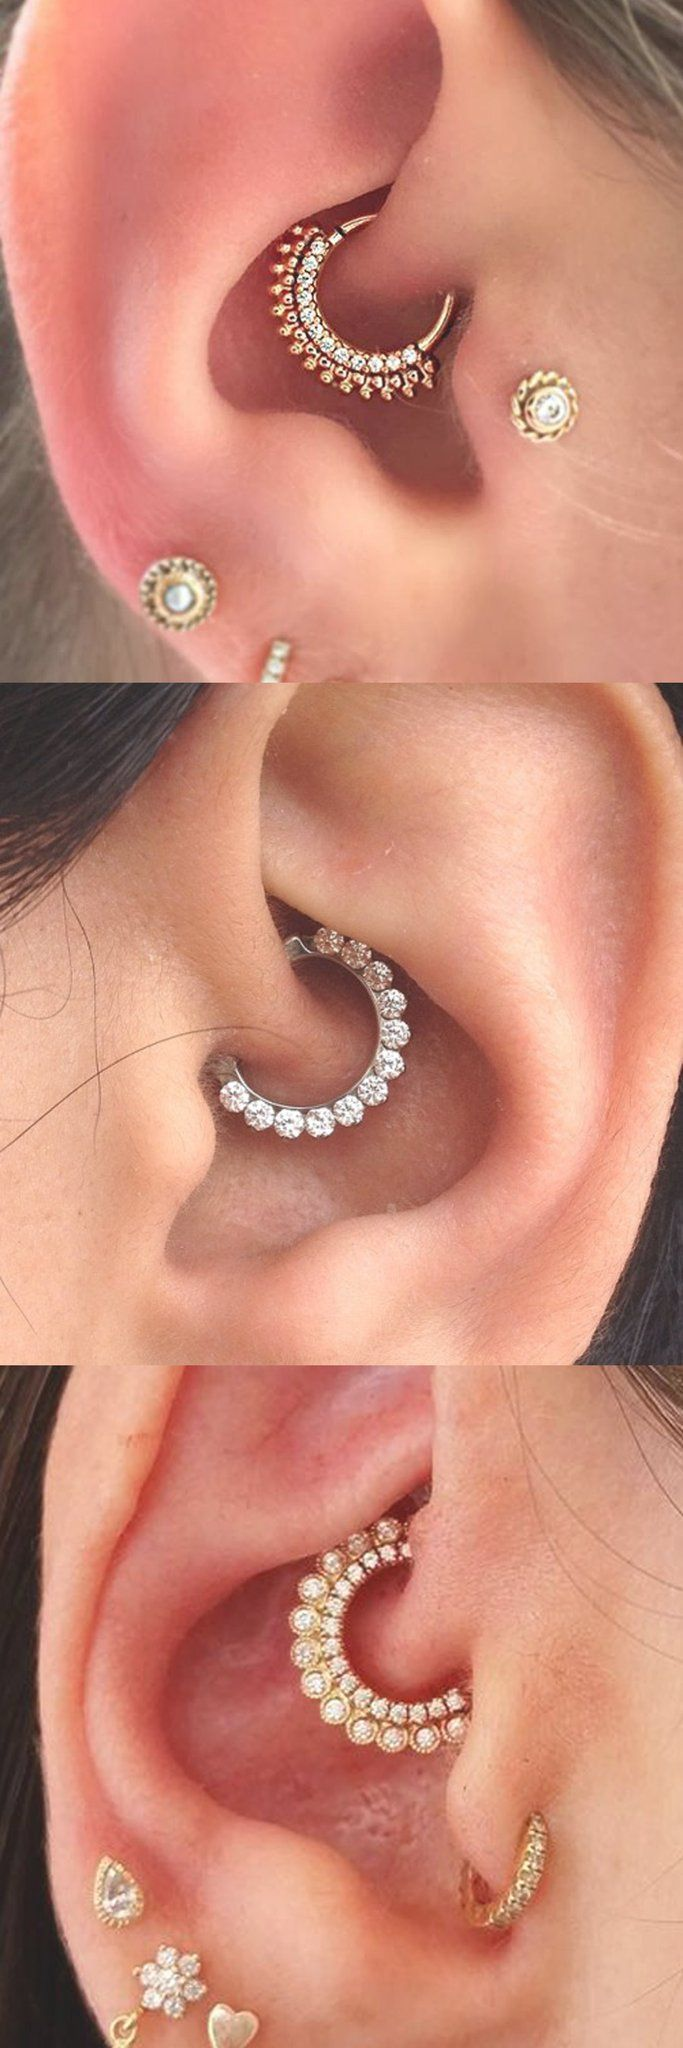 Nose and ear piercing   Trendy Ear Piercing Ideas at MyBodiArt  Daith Piercing